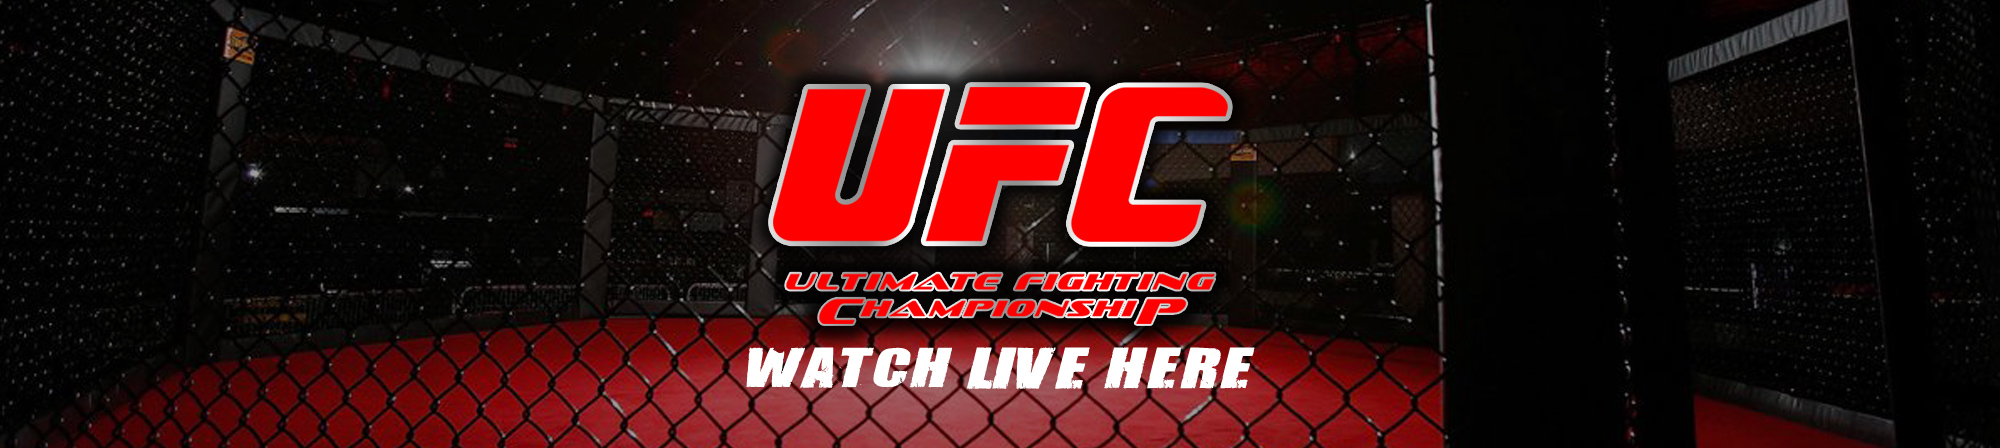 UFC-Slide-2000x448